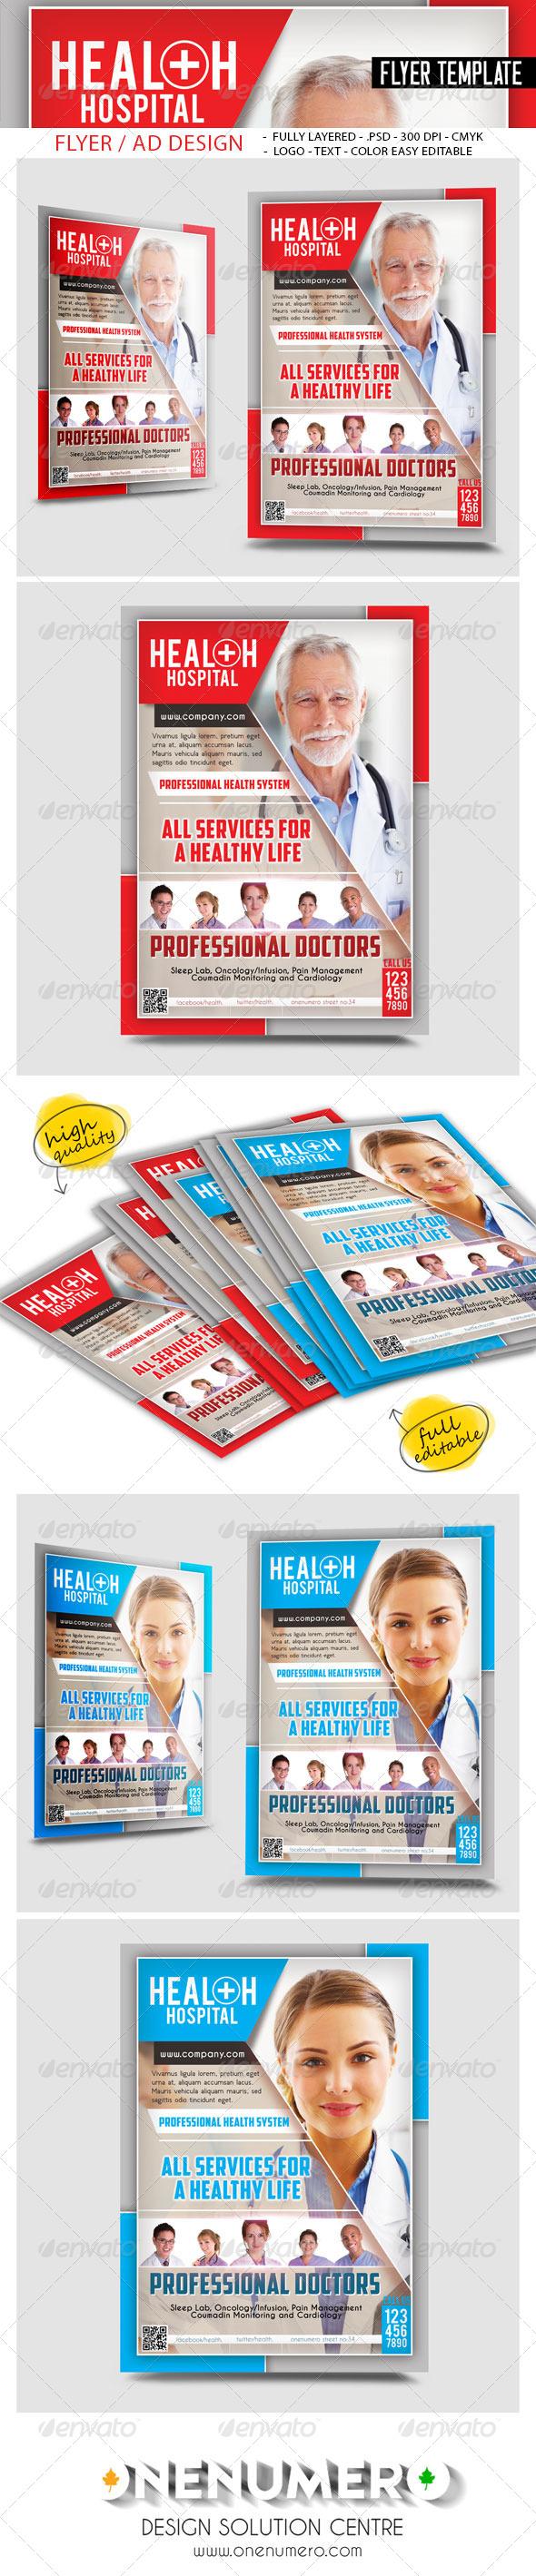 GraphicRiver Health Hospital Flyer Templates 7793064